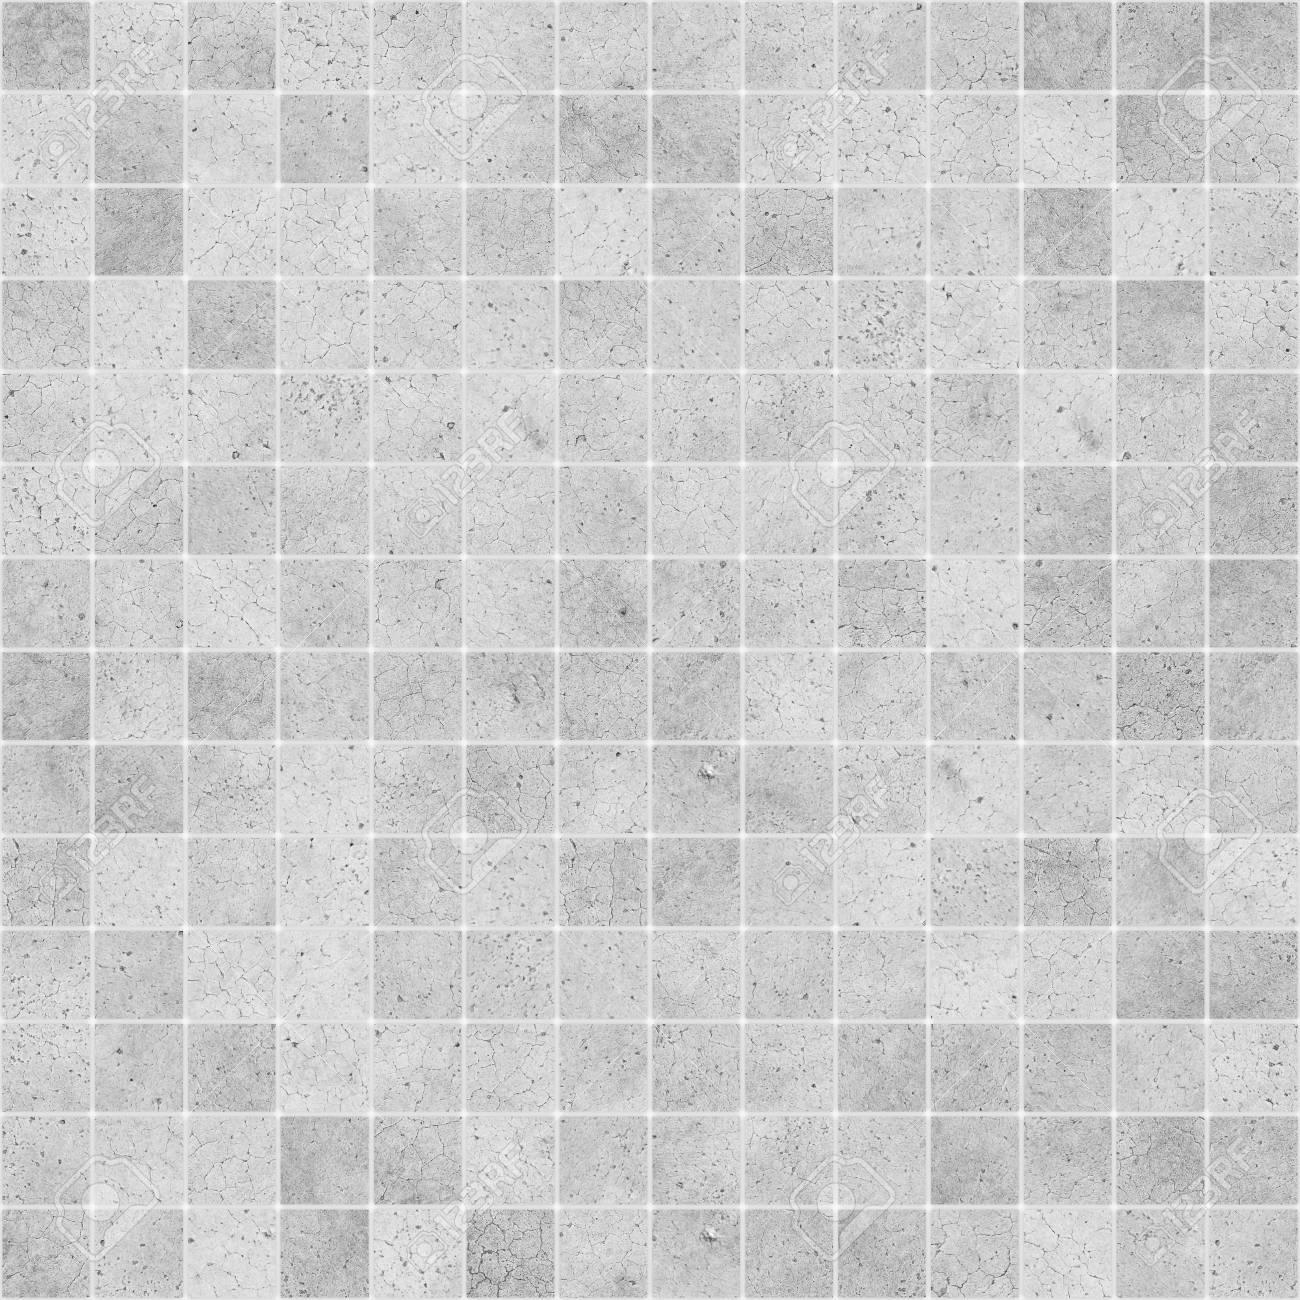 Concrete Mosaic Tile Seamless Texture